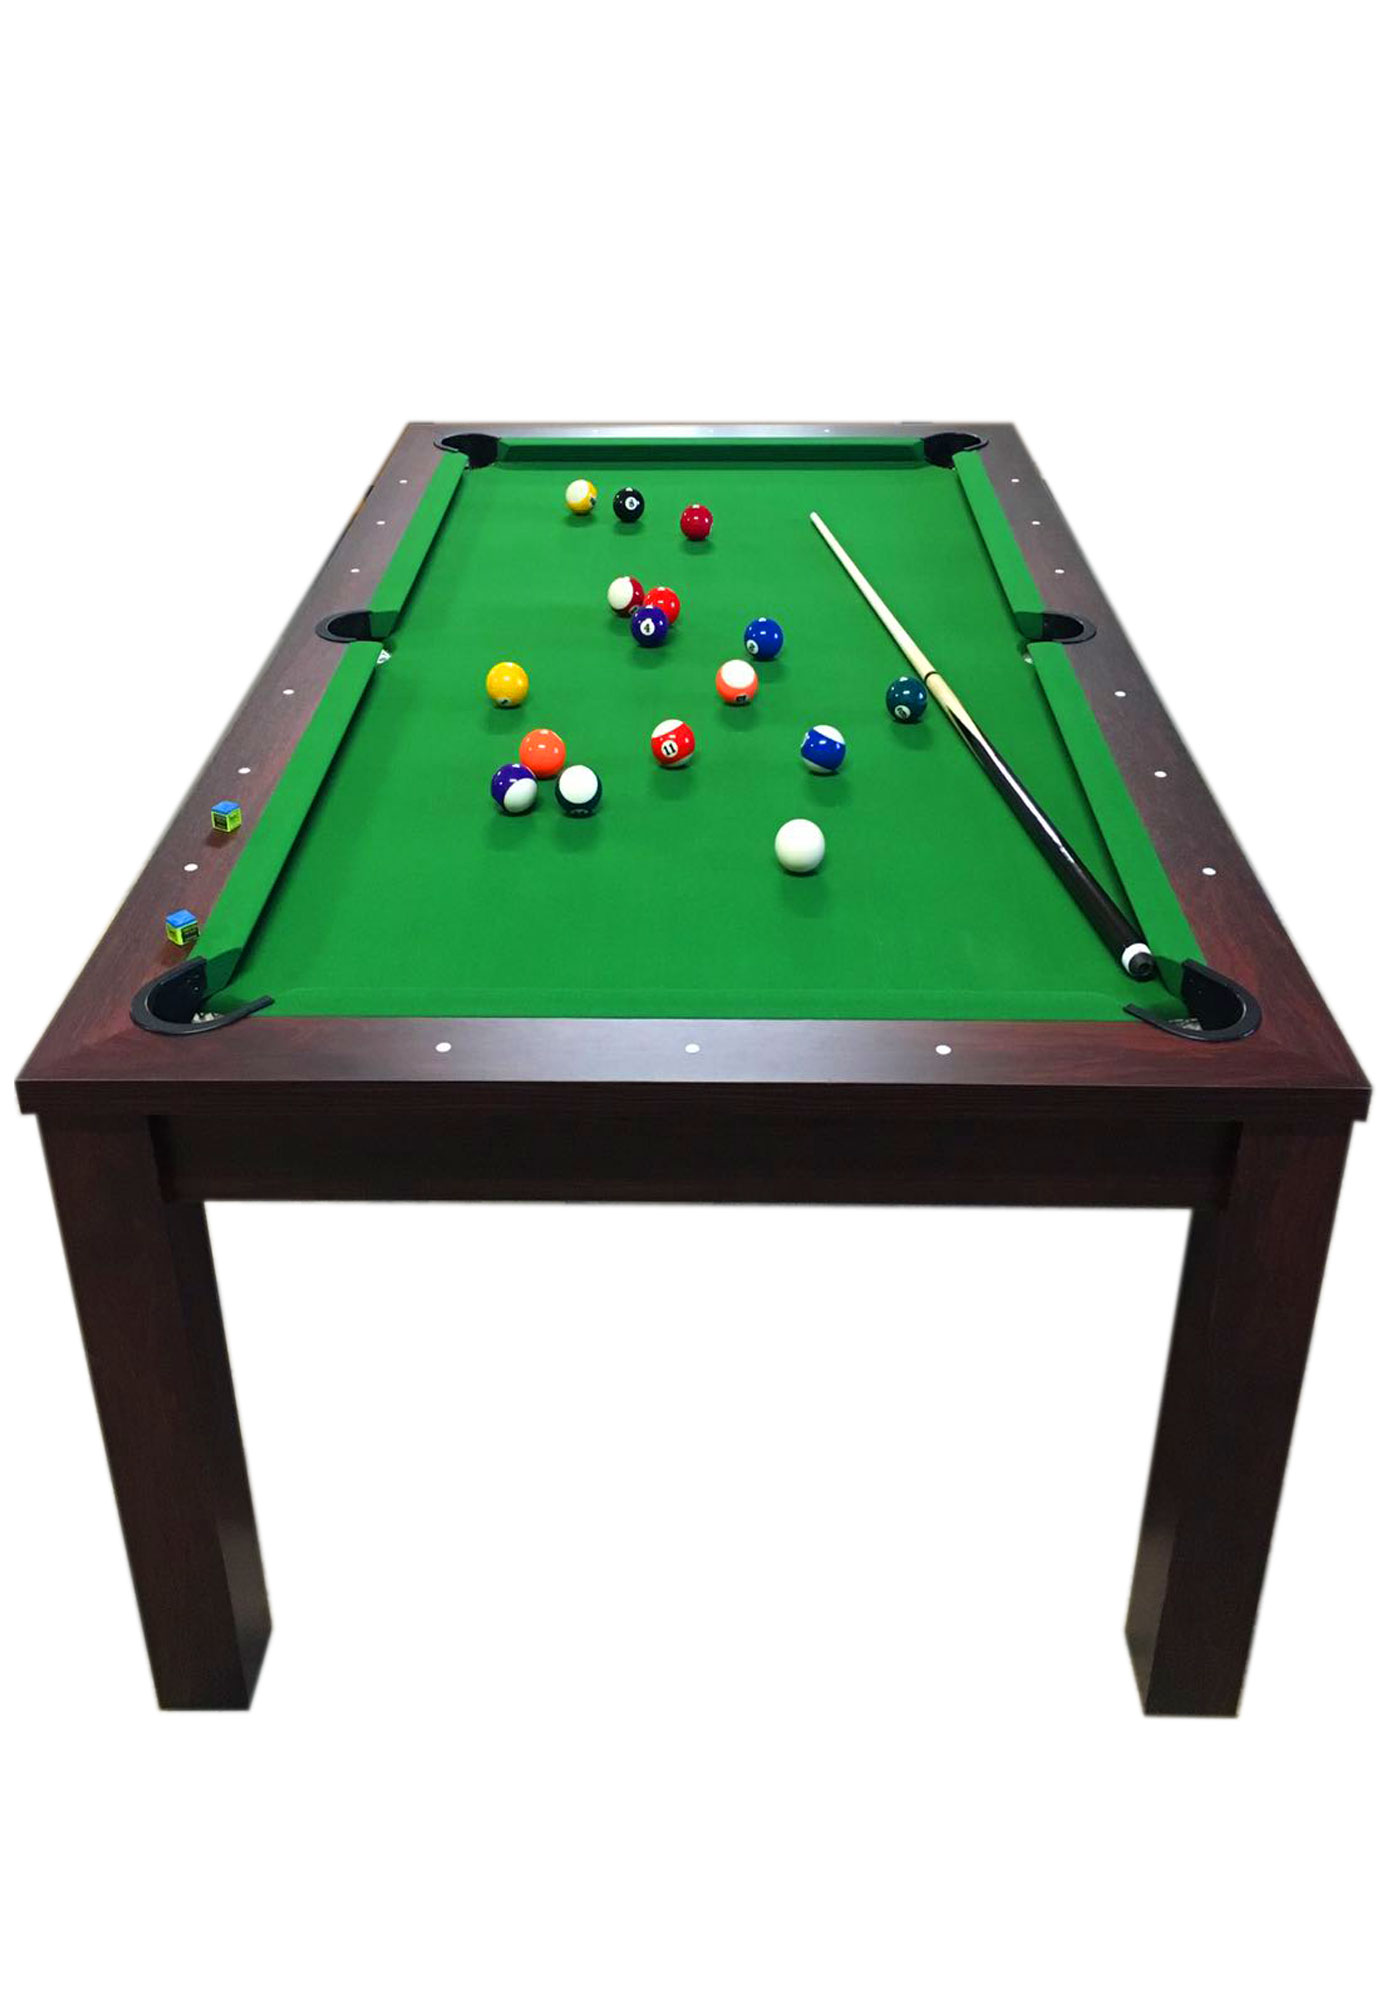 7 pieds green star full optional table de billard transformable en table. Black Bedroom Furniture Sets. Home Design Ideas